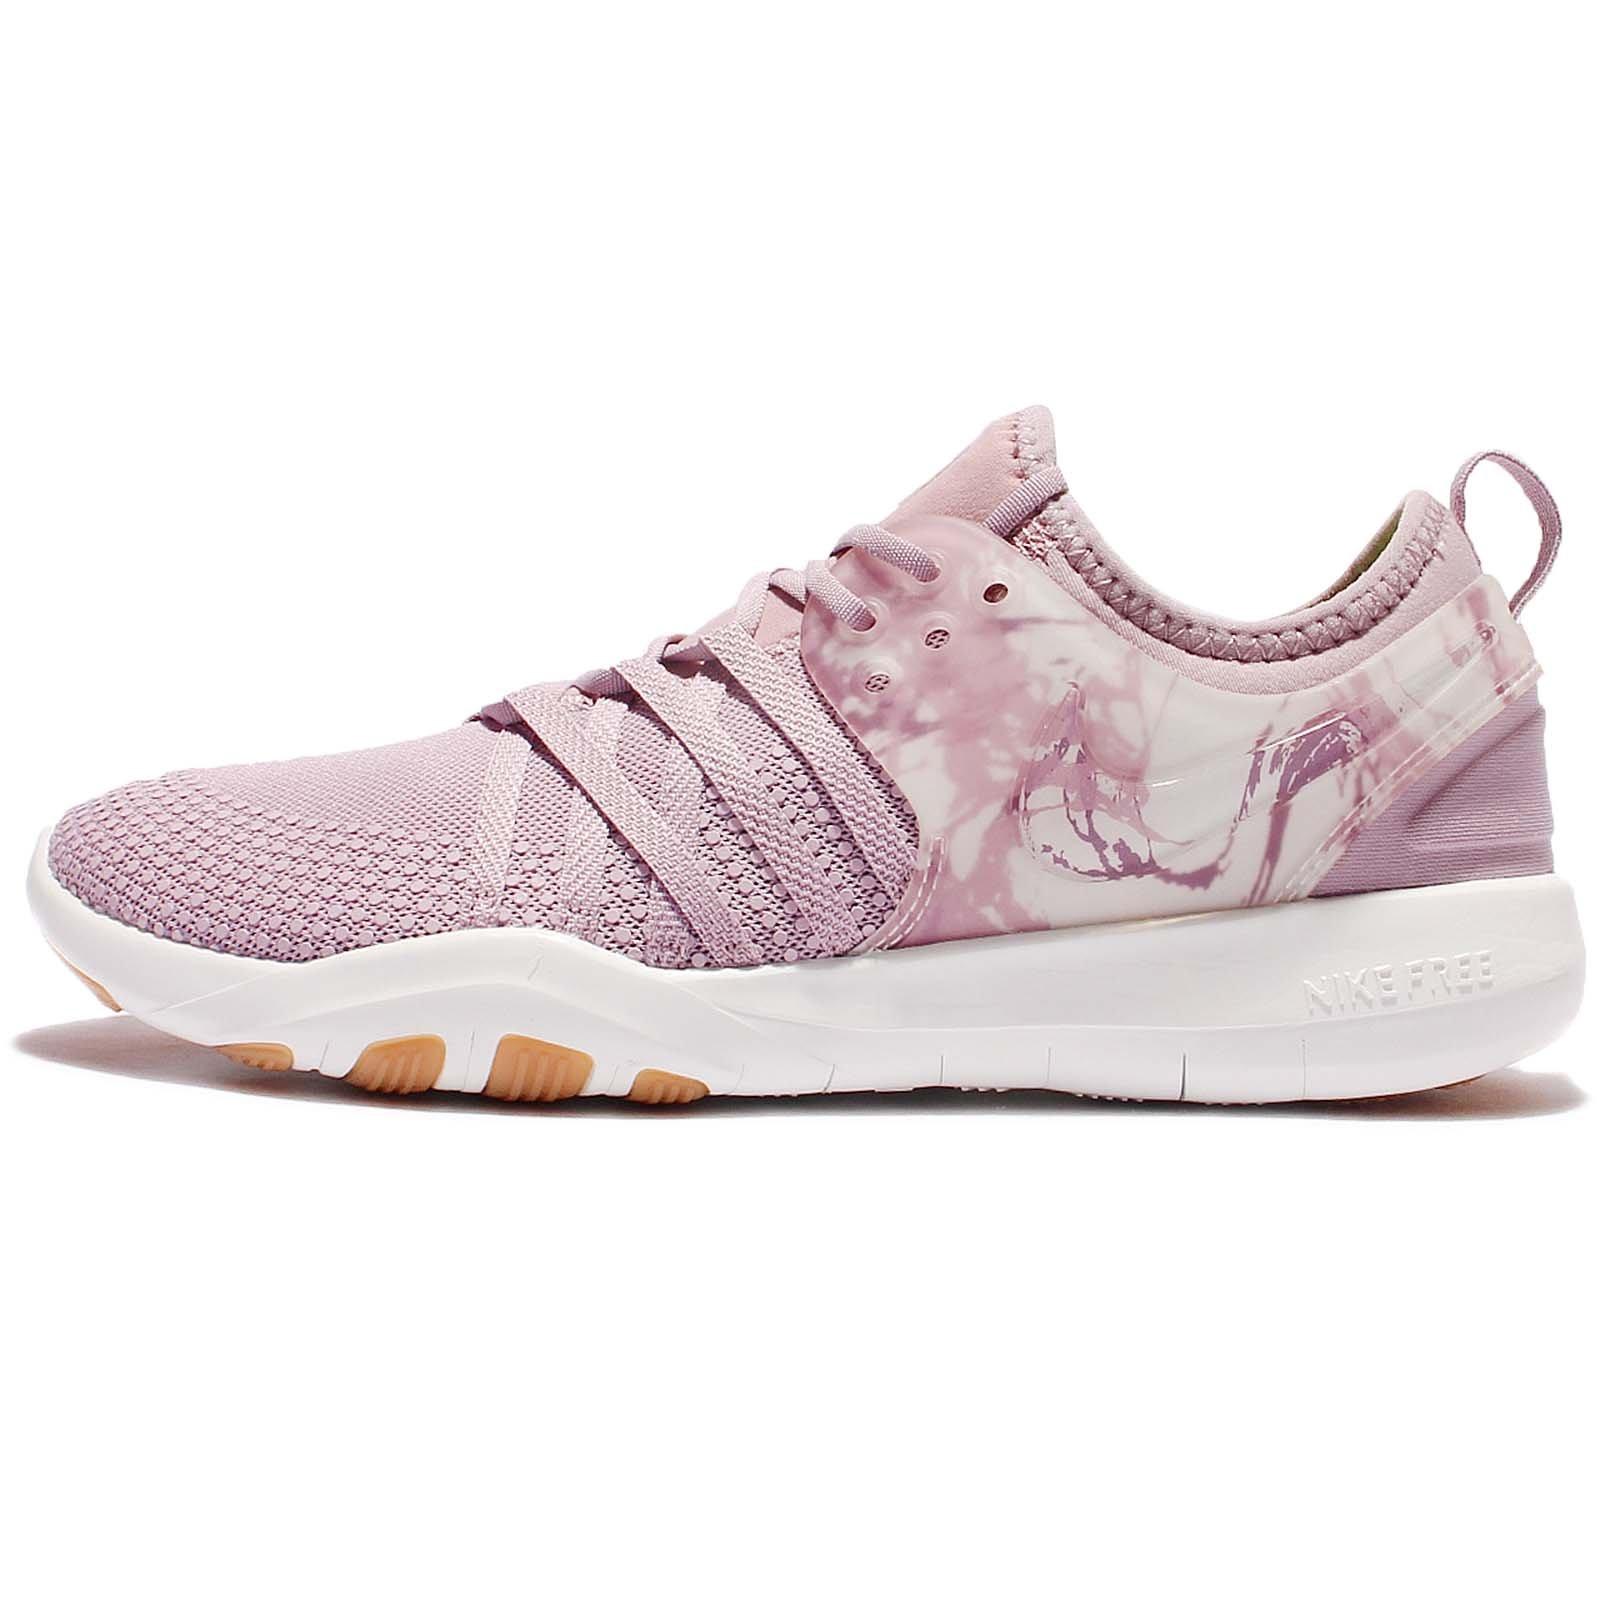 c26450e4c7d0 Galleon - Nike Women s Free TR 7 Training Shoe